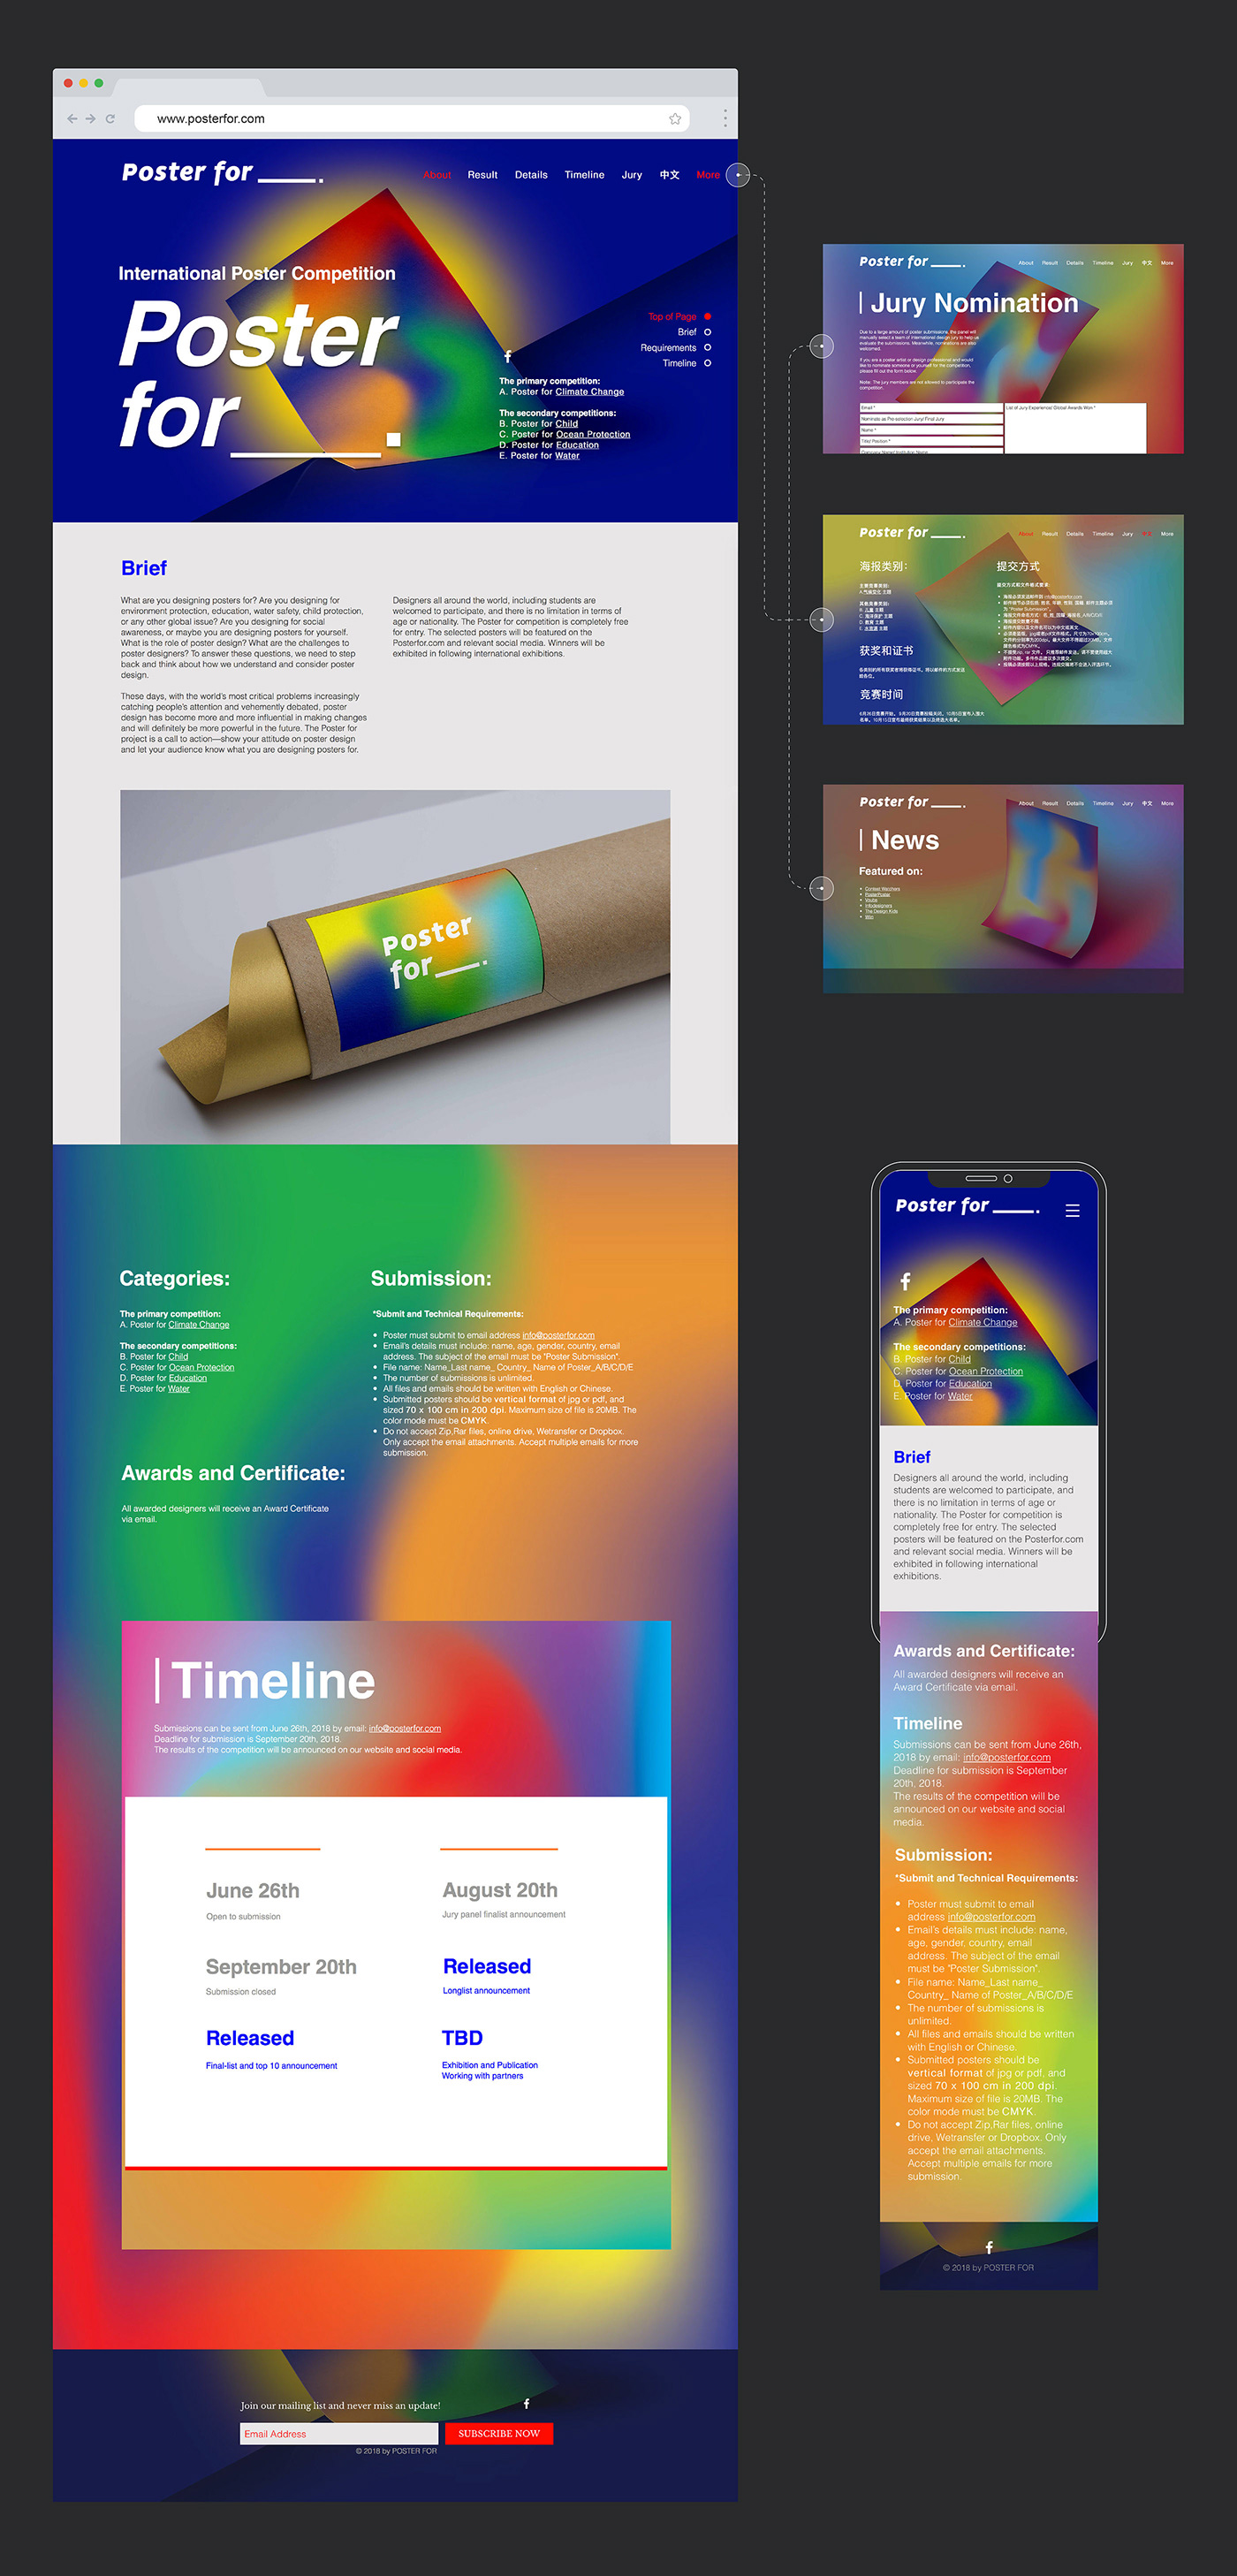 Event Design Identity Design visual identity Poster for Branding design Website Design design competition Non-Profit Project colors gradient